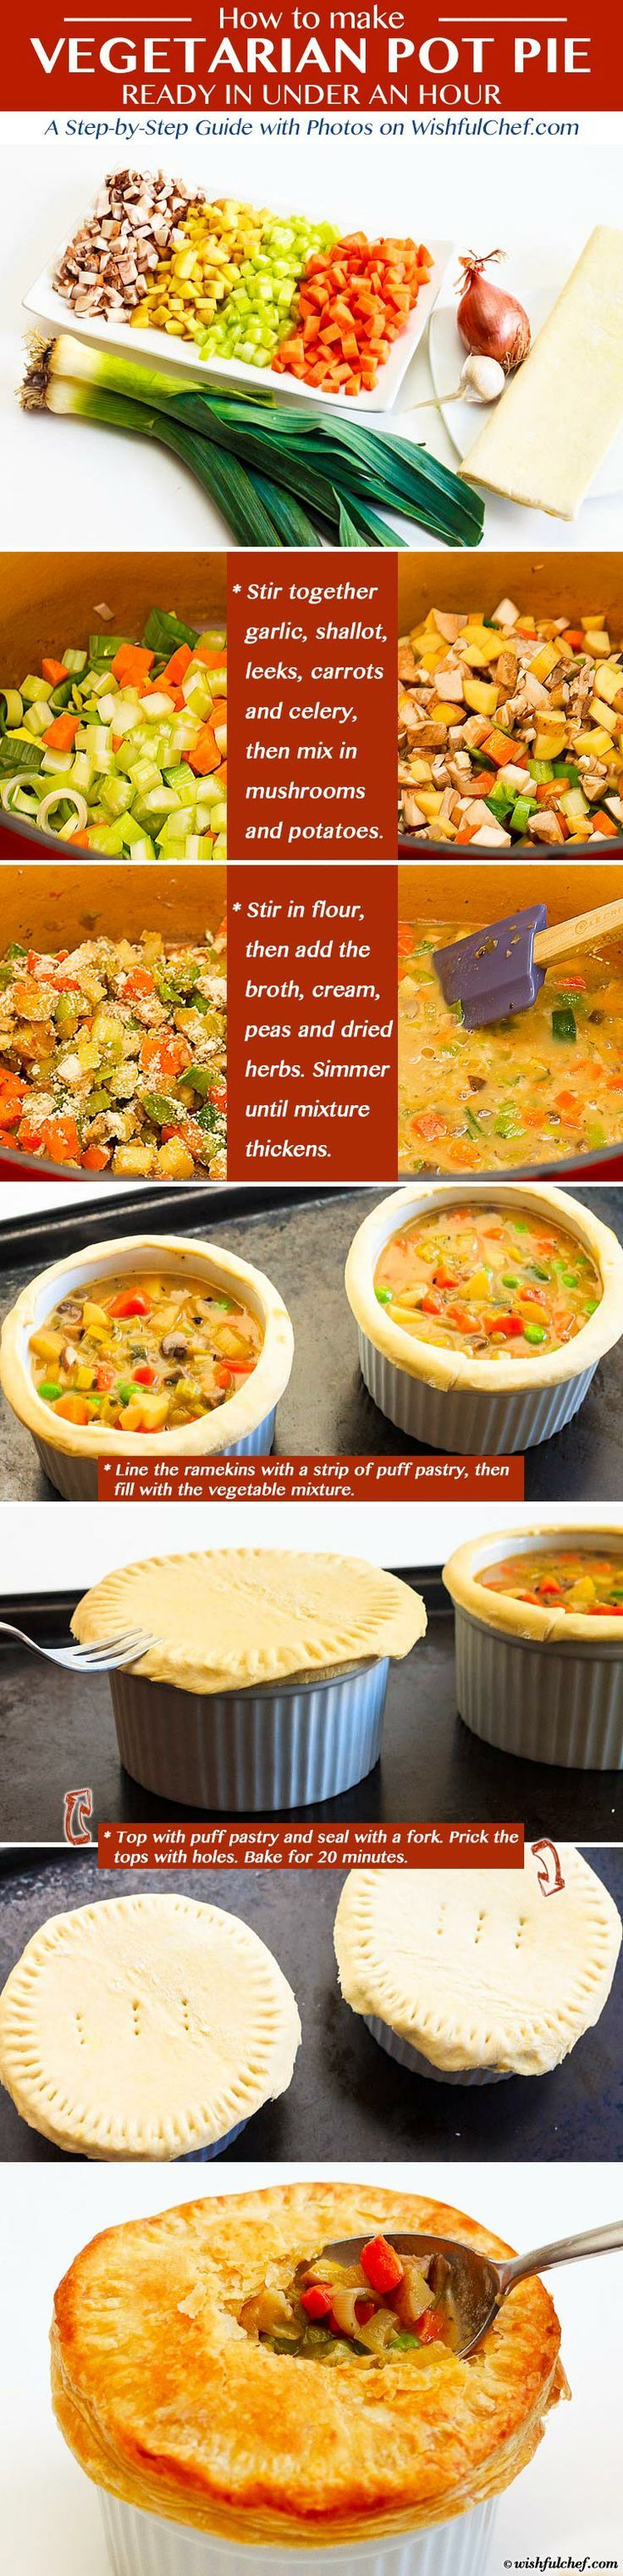 vegetable pot pie / http://www.wishfulchef.com/vegetarian-pot-pie-recipe/